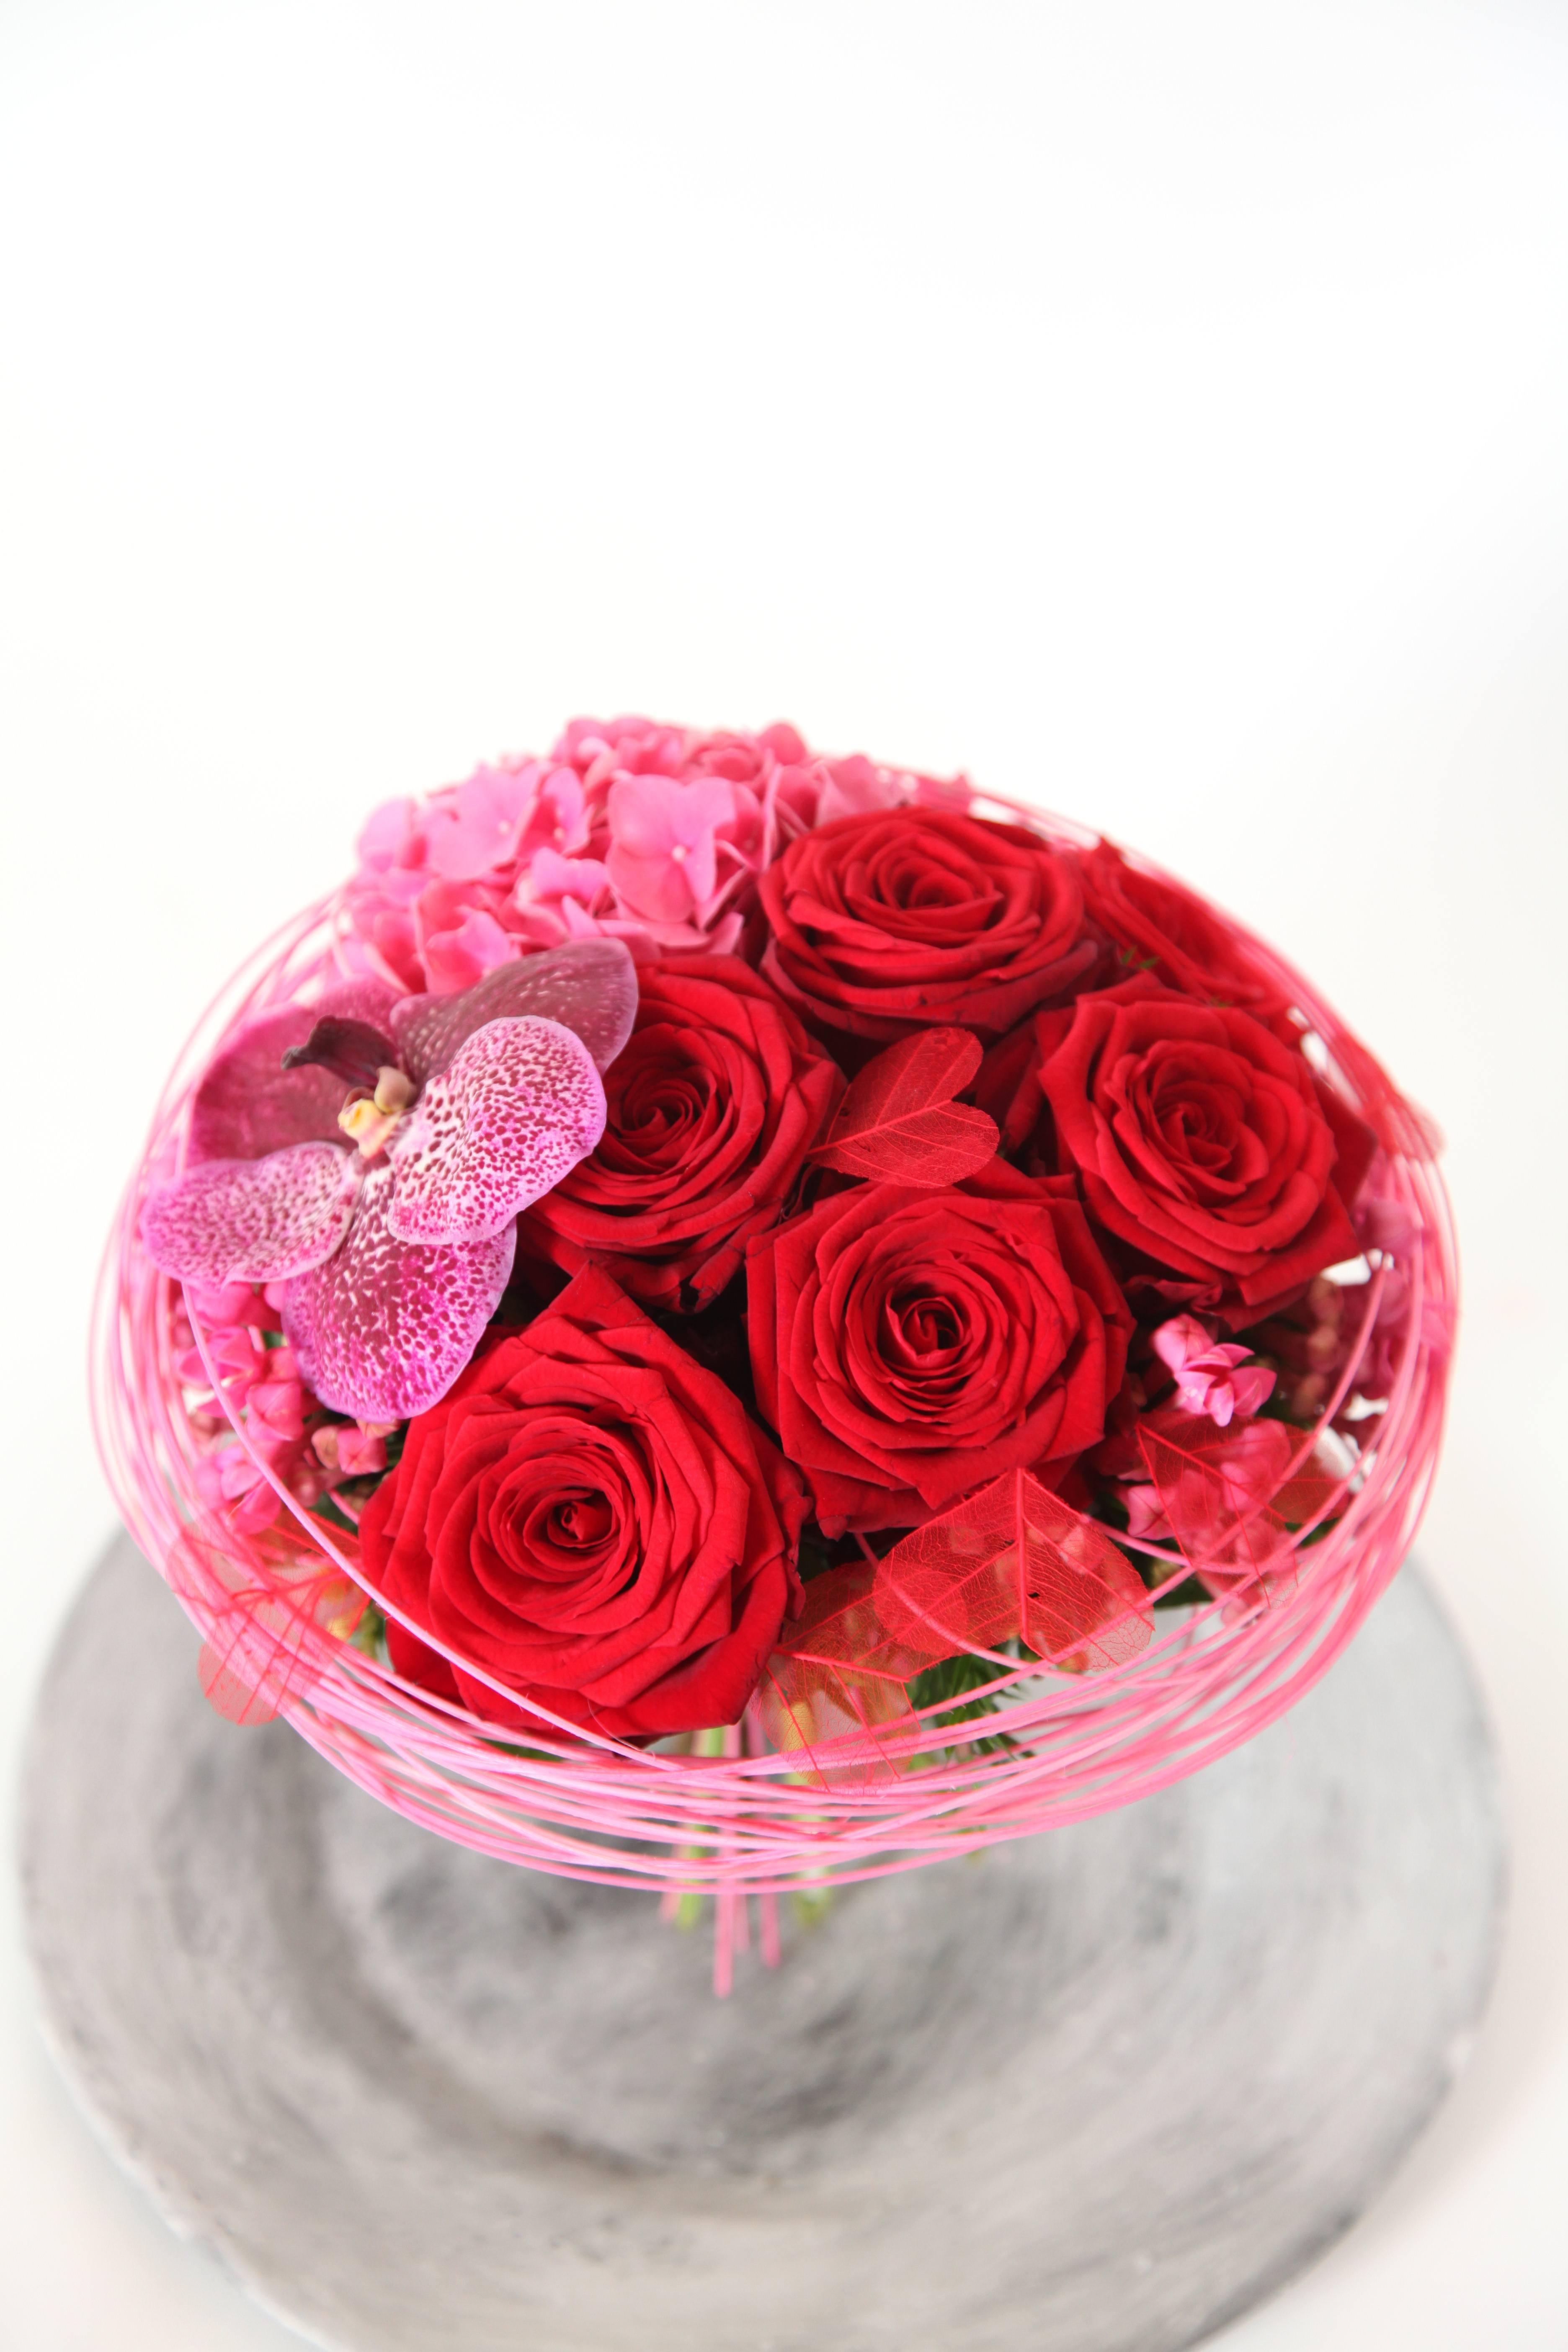 Porta Nova Red Naomi - Floral Fundamentals valentines day